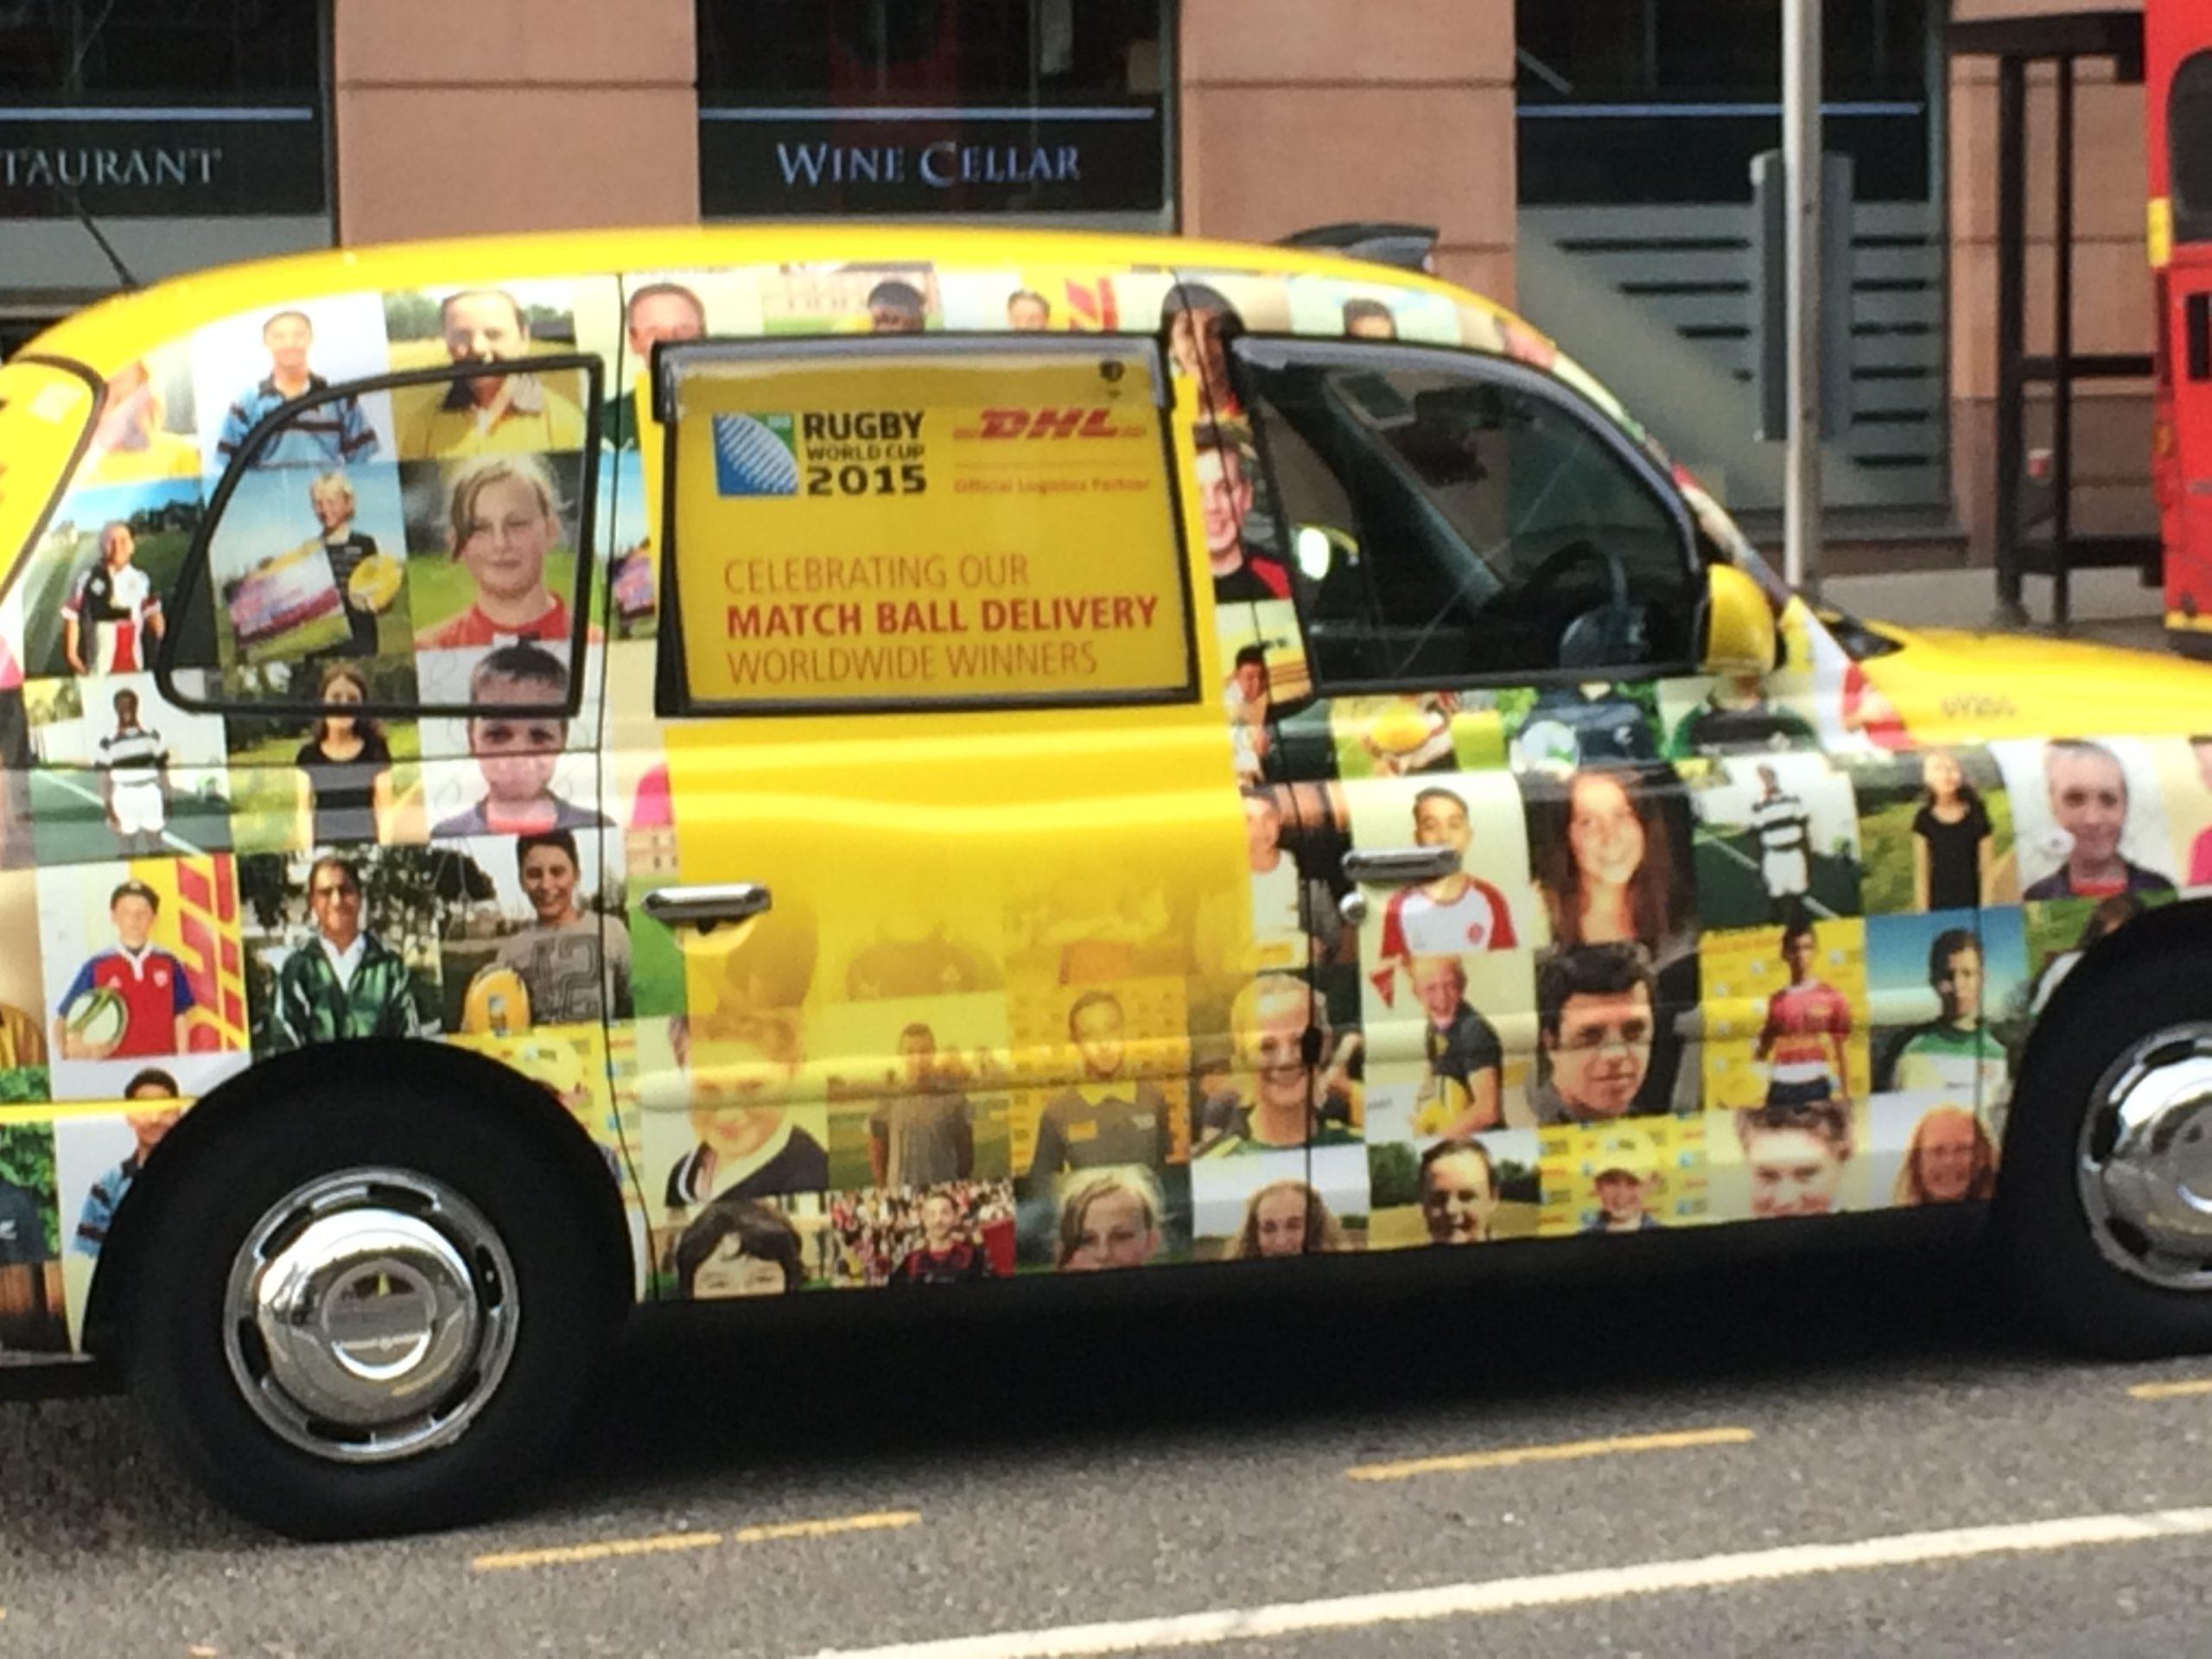 london-taxi-side-car-window-graphics